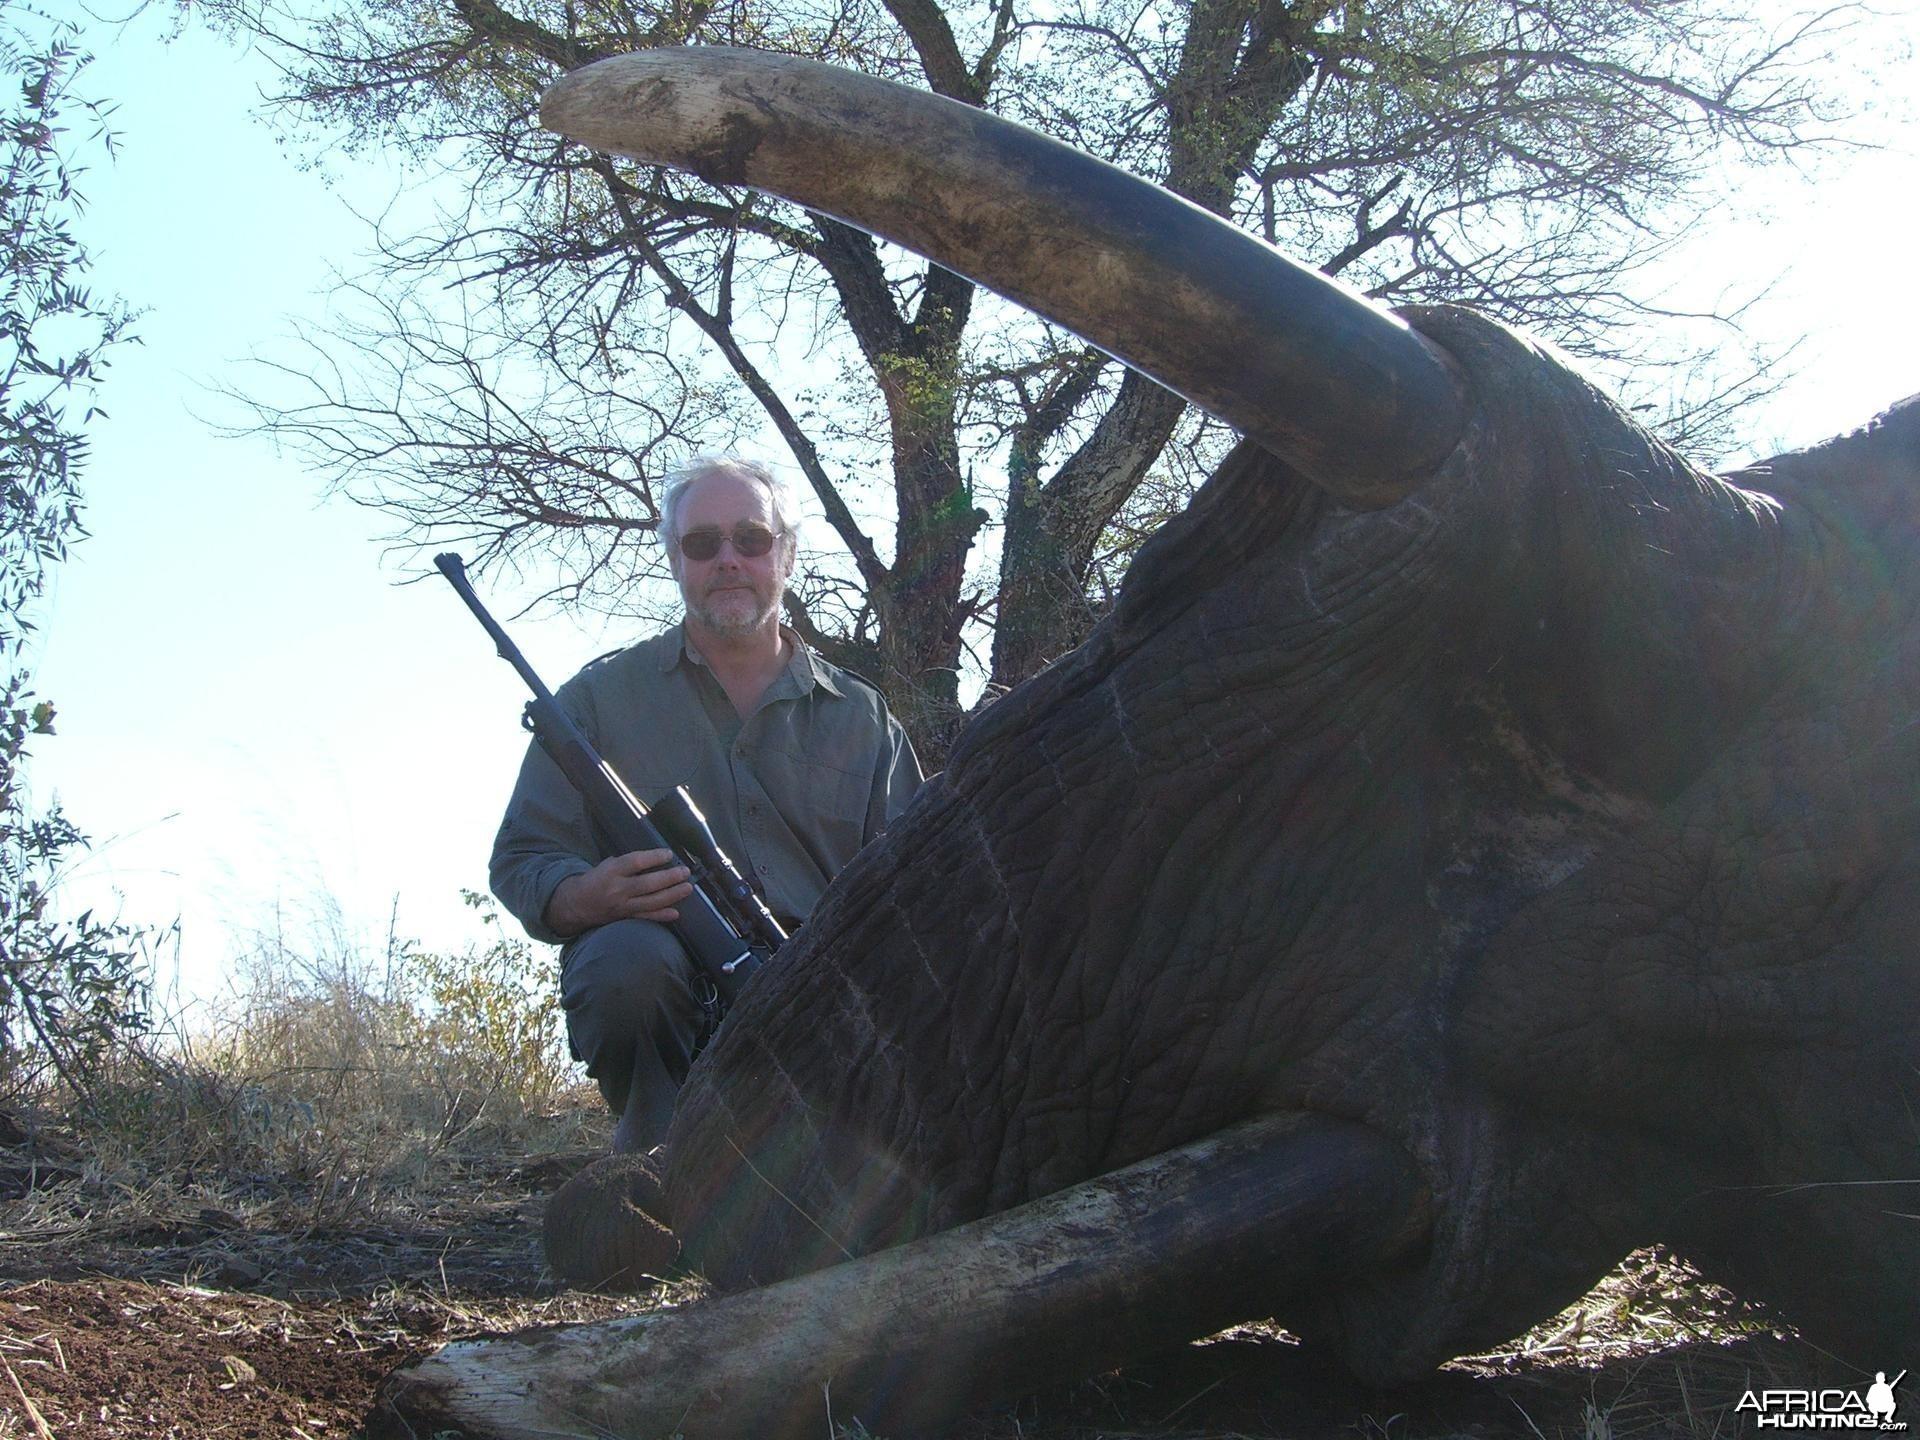 62 pound Elephant Bull